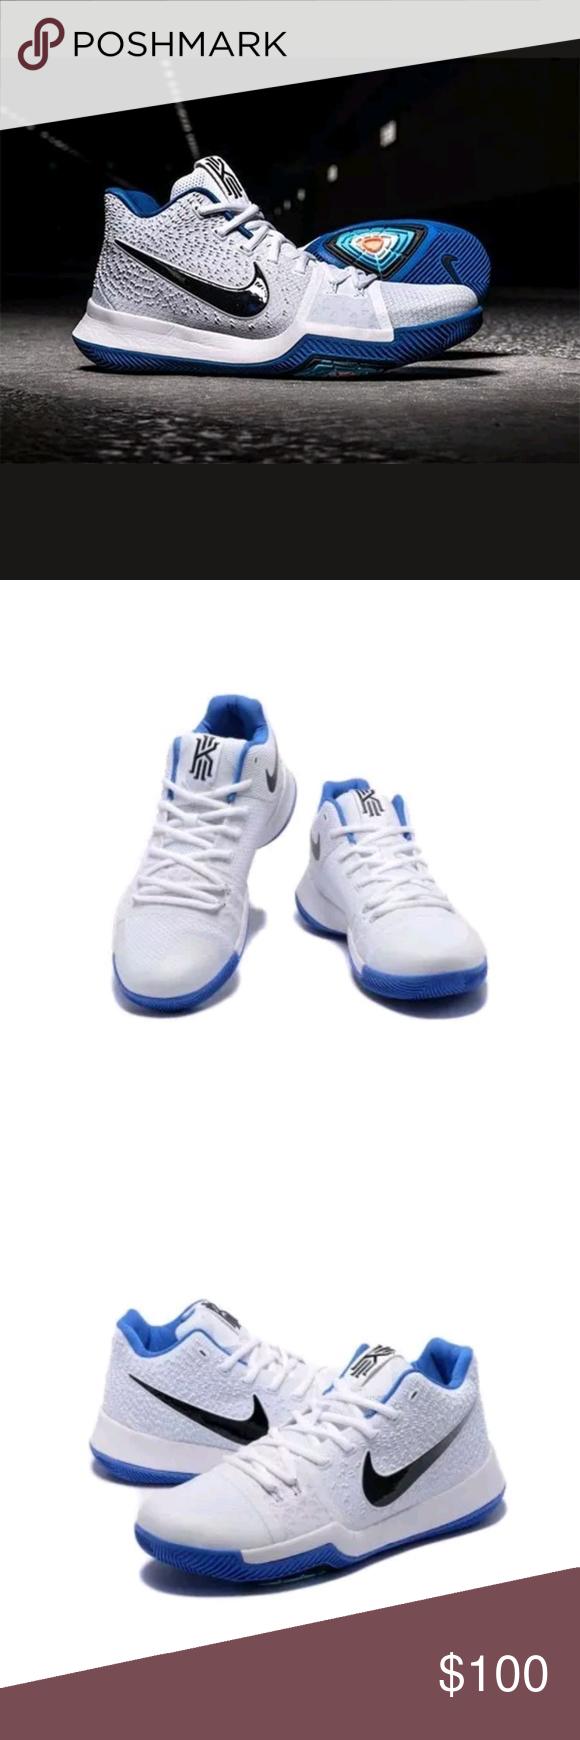 online retailer 7d073 1fbf5 Men s Nike Kyrie 3